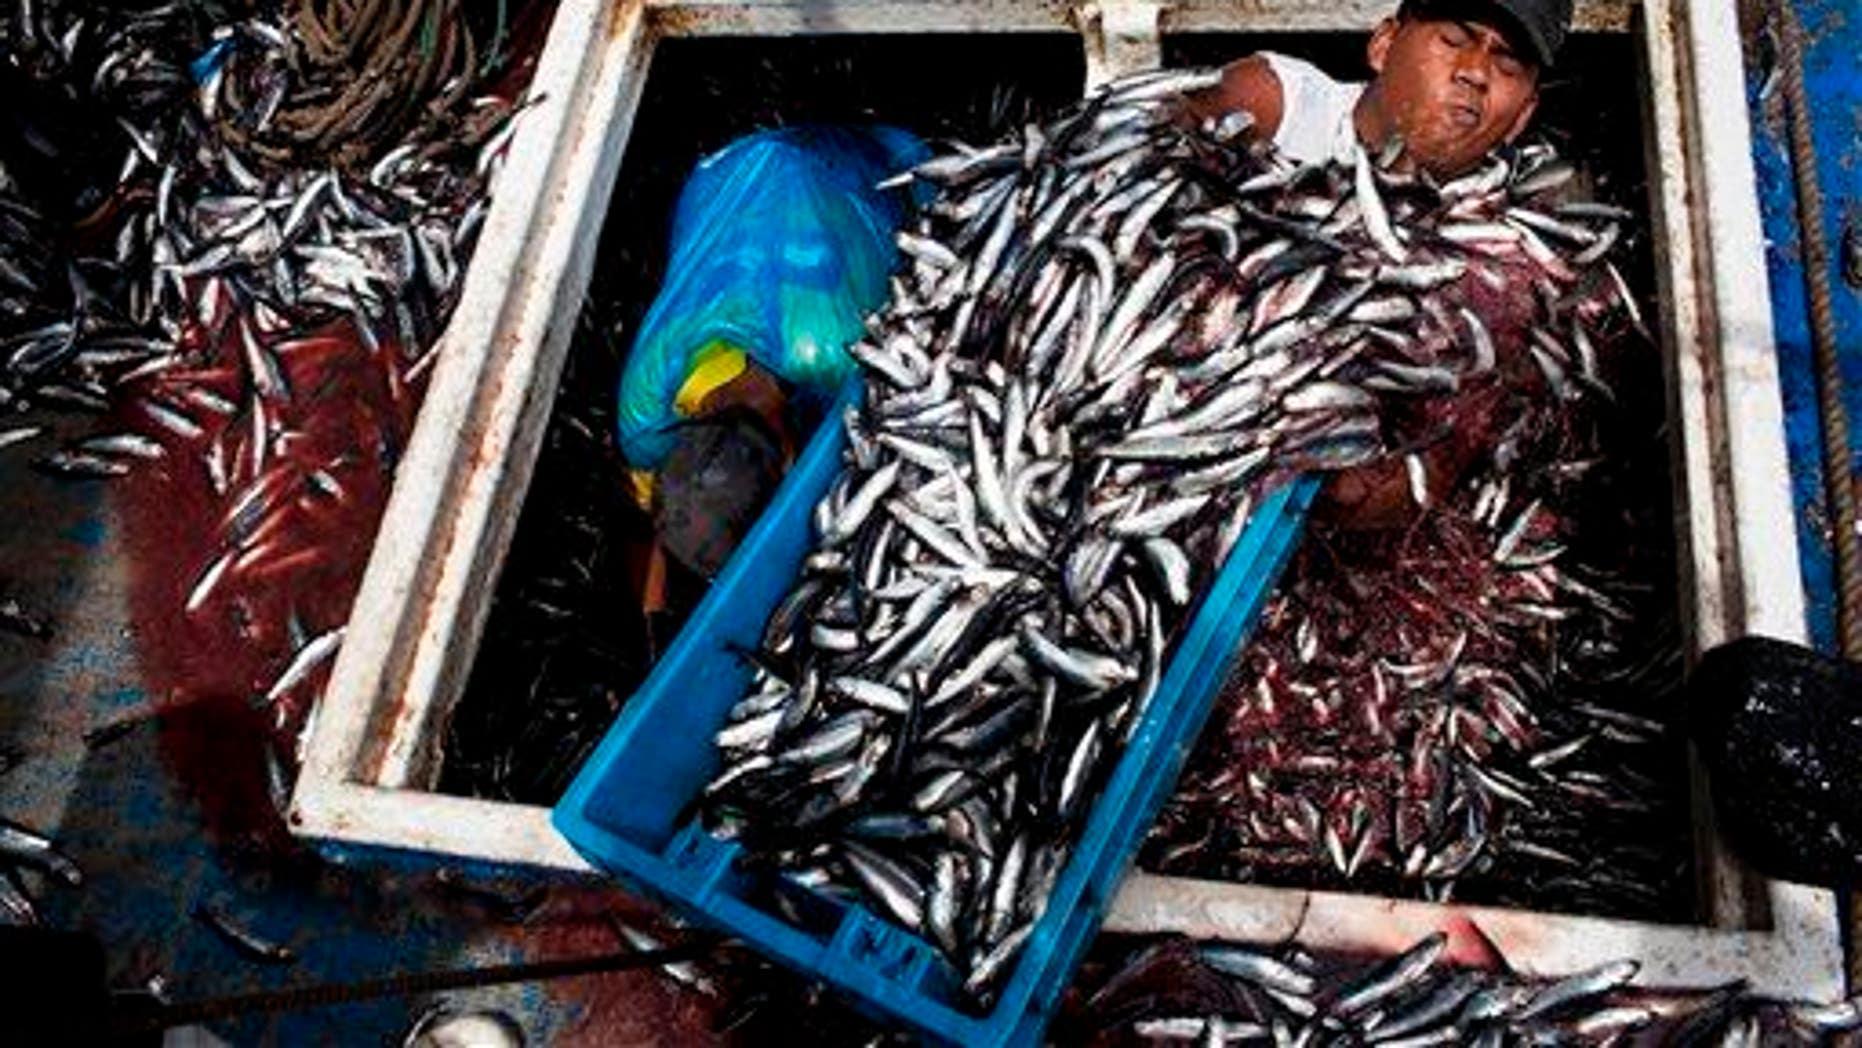 In this Dec. 7, 2012 photo, Marvin Vega unloads a crate of anchovies in Peru.